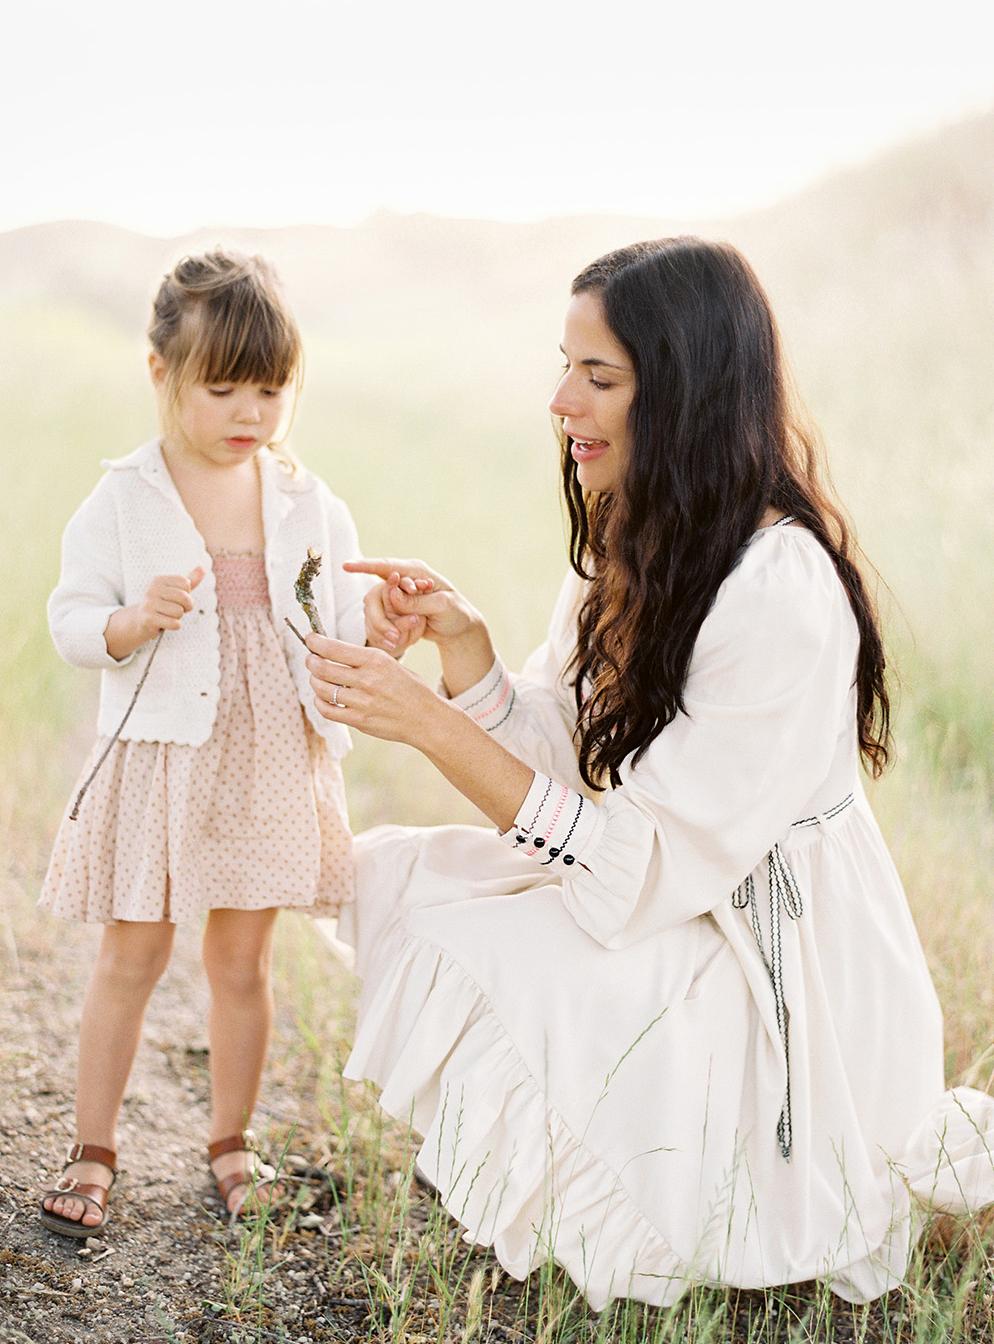 06_daughter-mother-portraits-552x750@2x.jpg